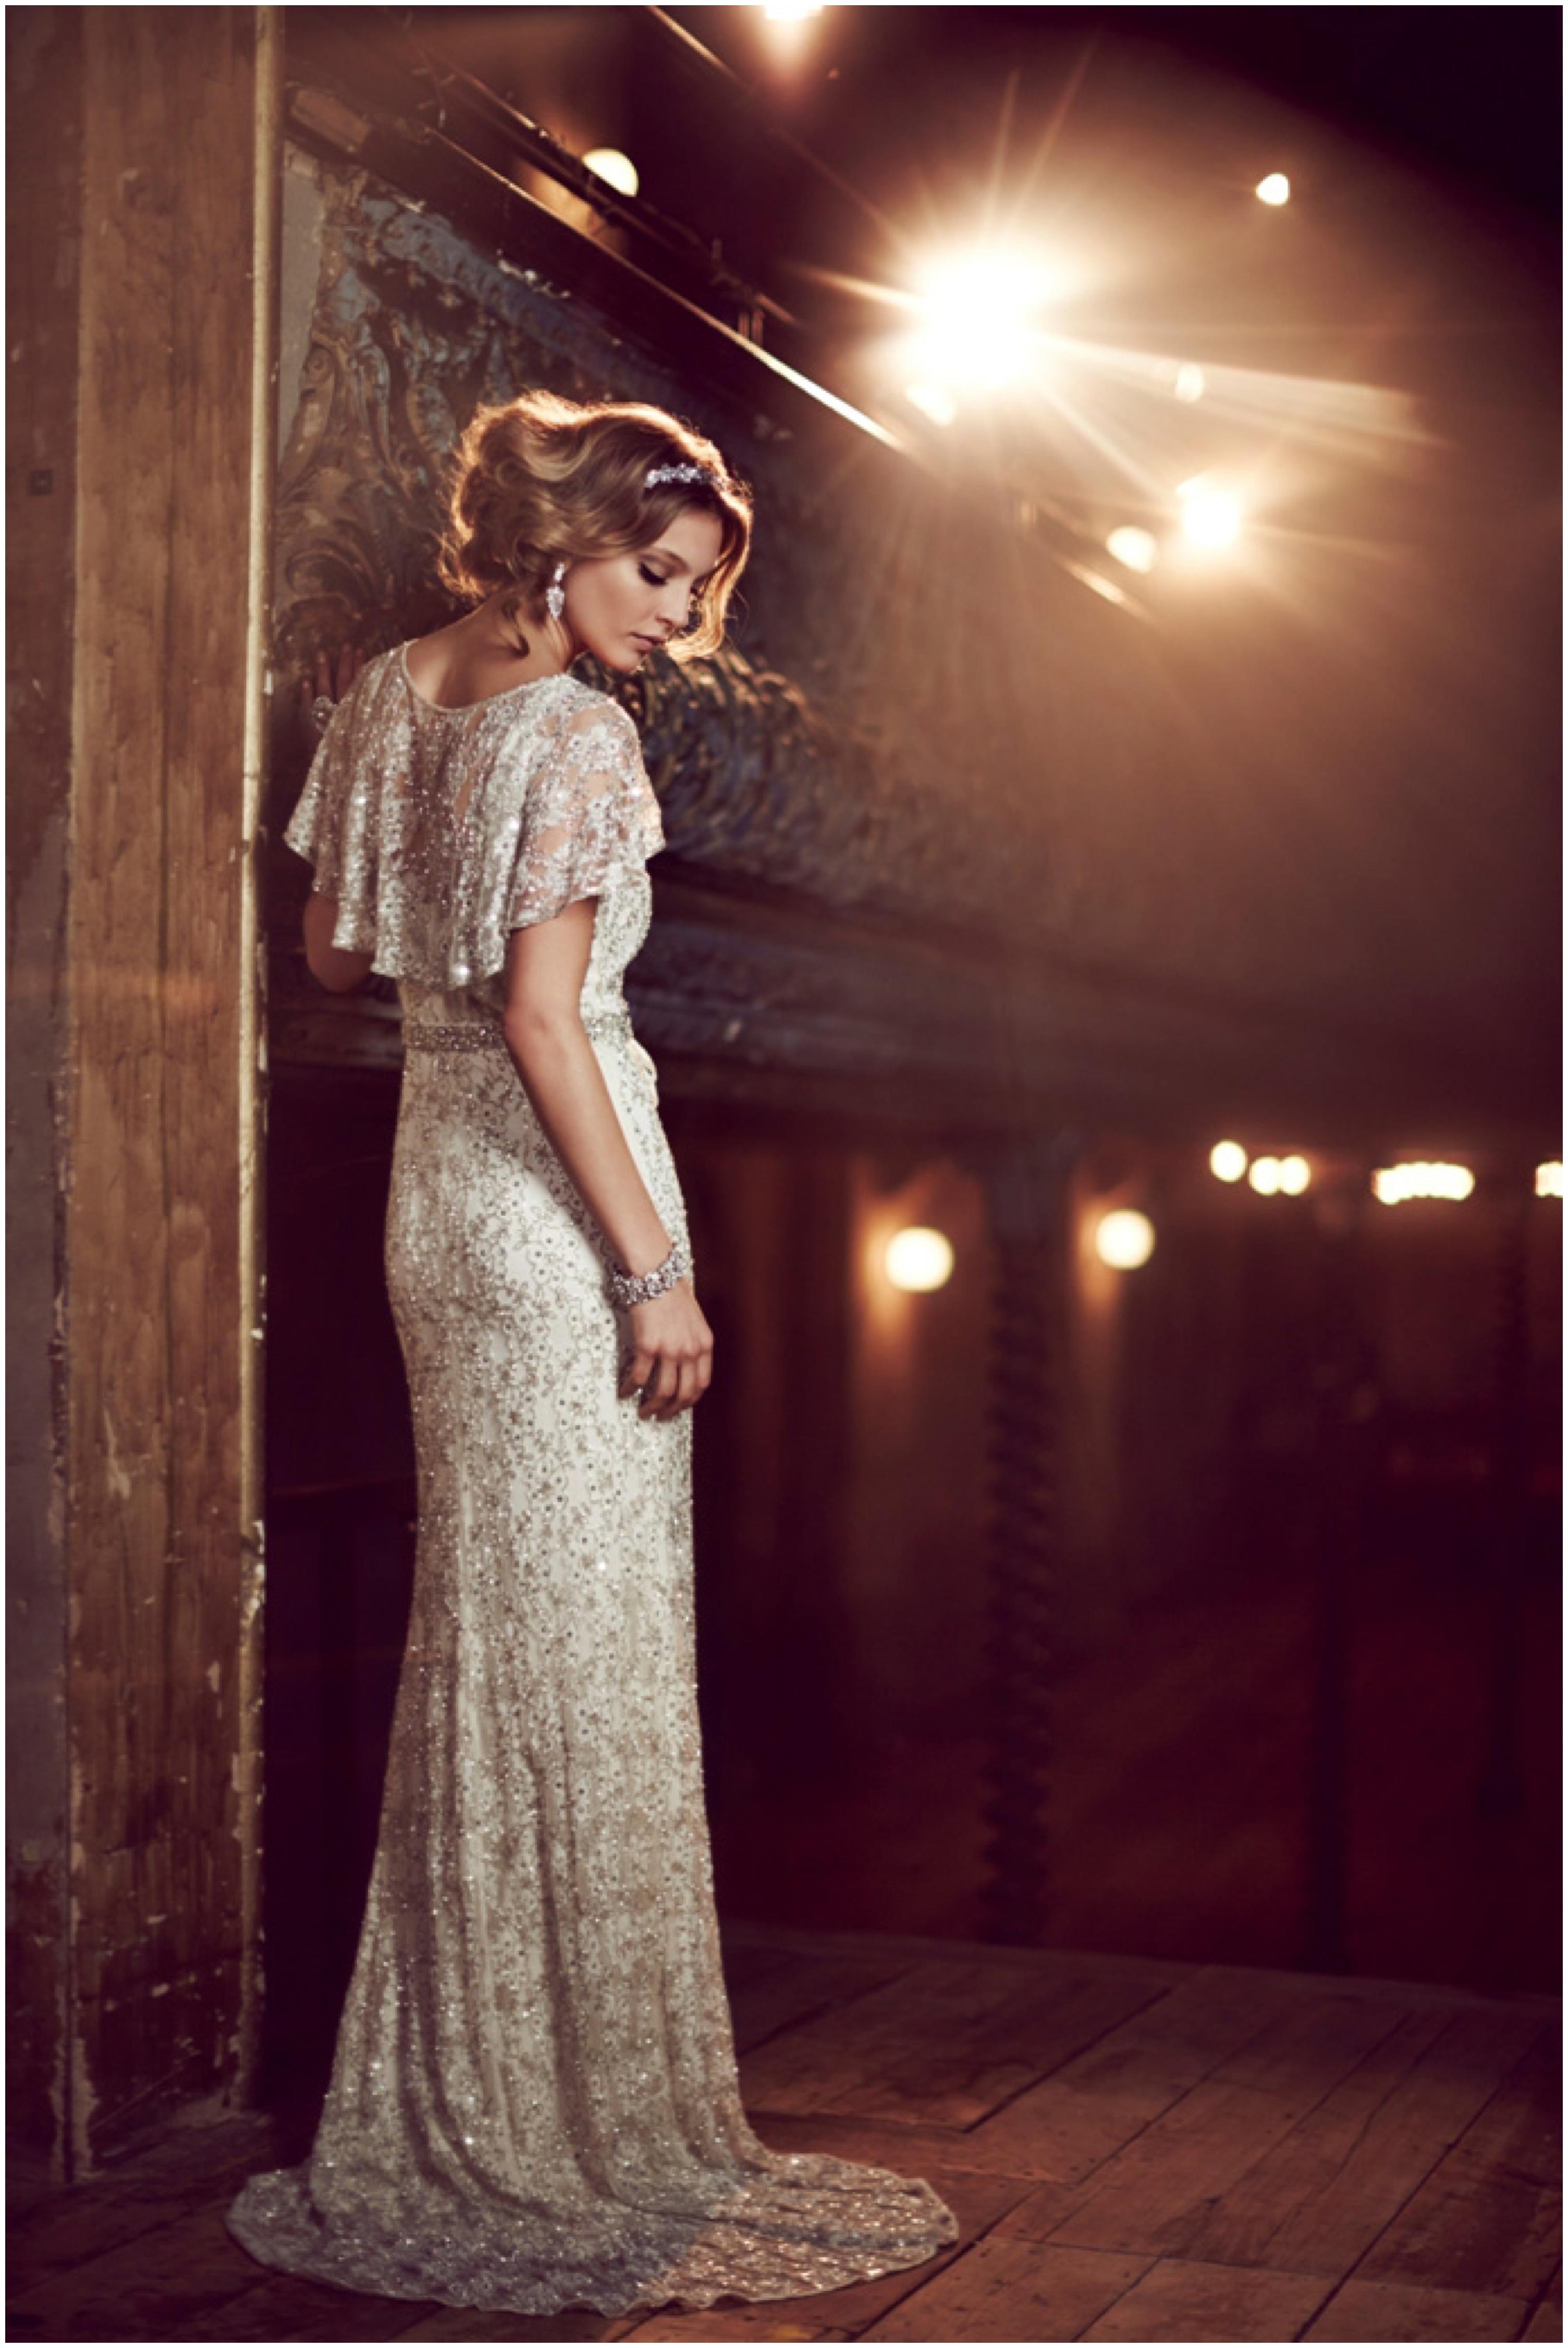 Wedding Inspiration: High St Fashion